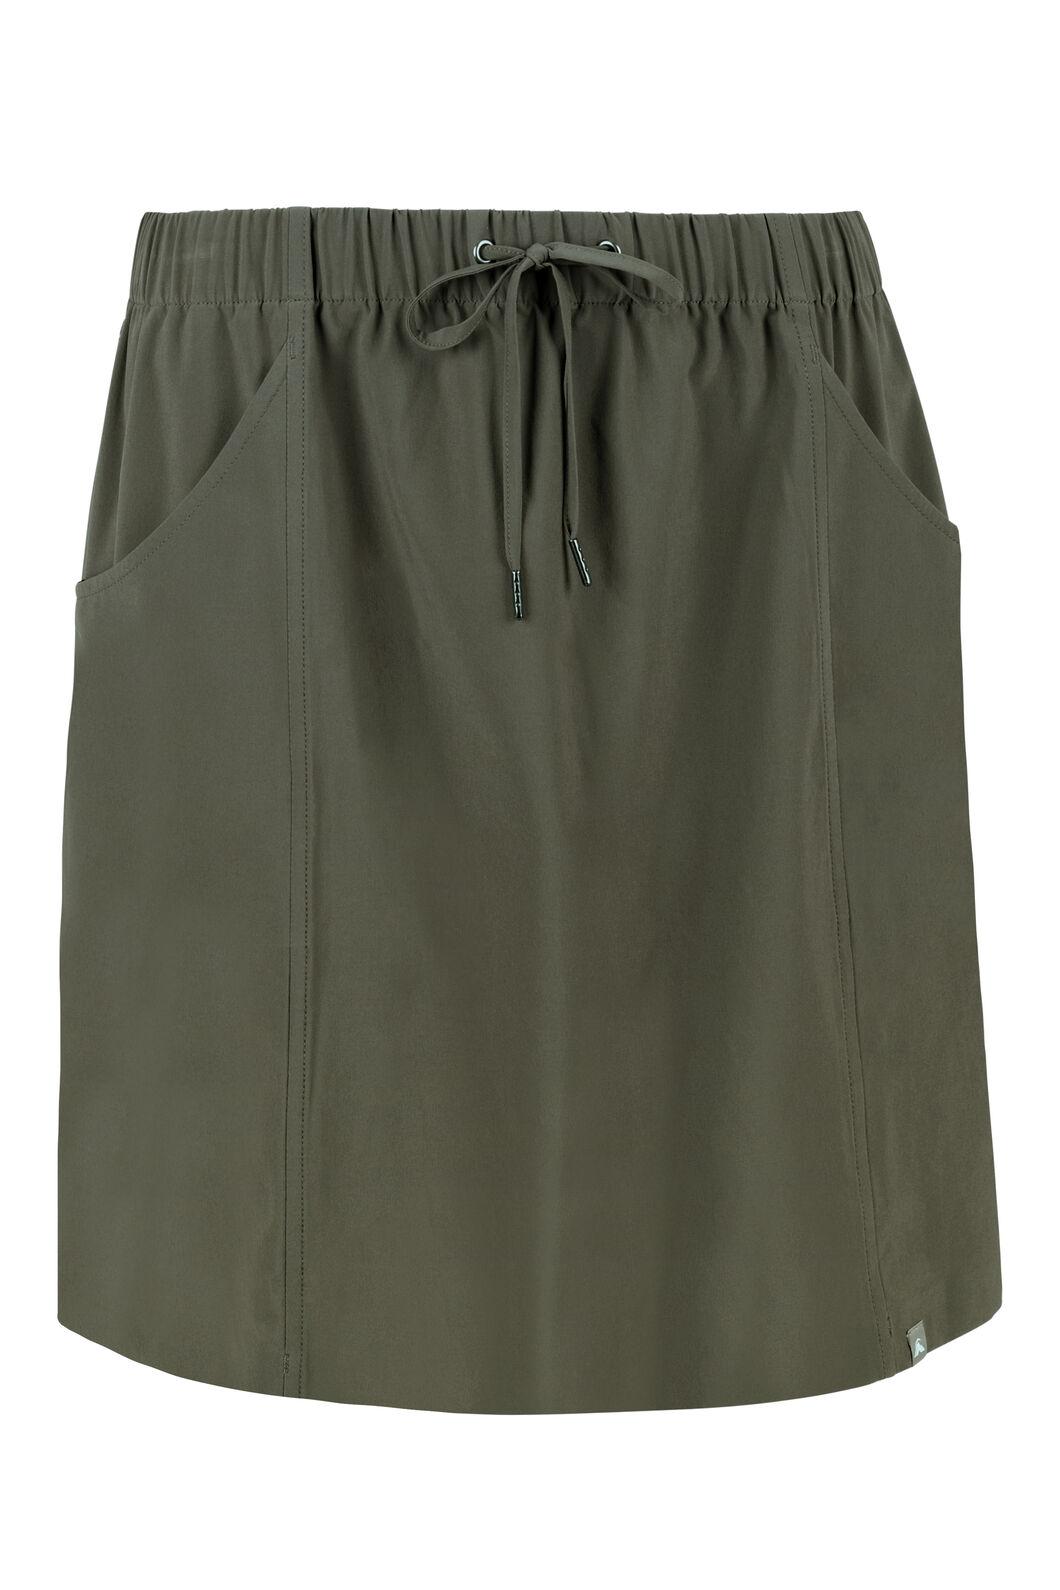 Macpac Mica Skirt - Women's, Deep Olive, hi-res